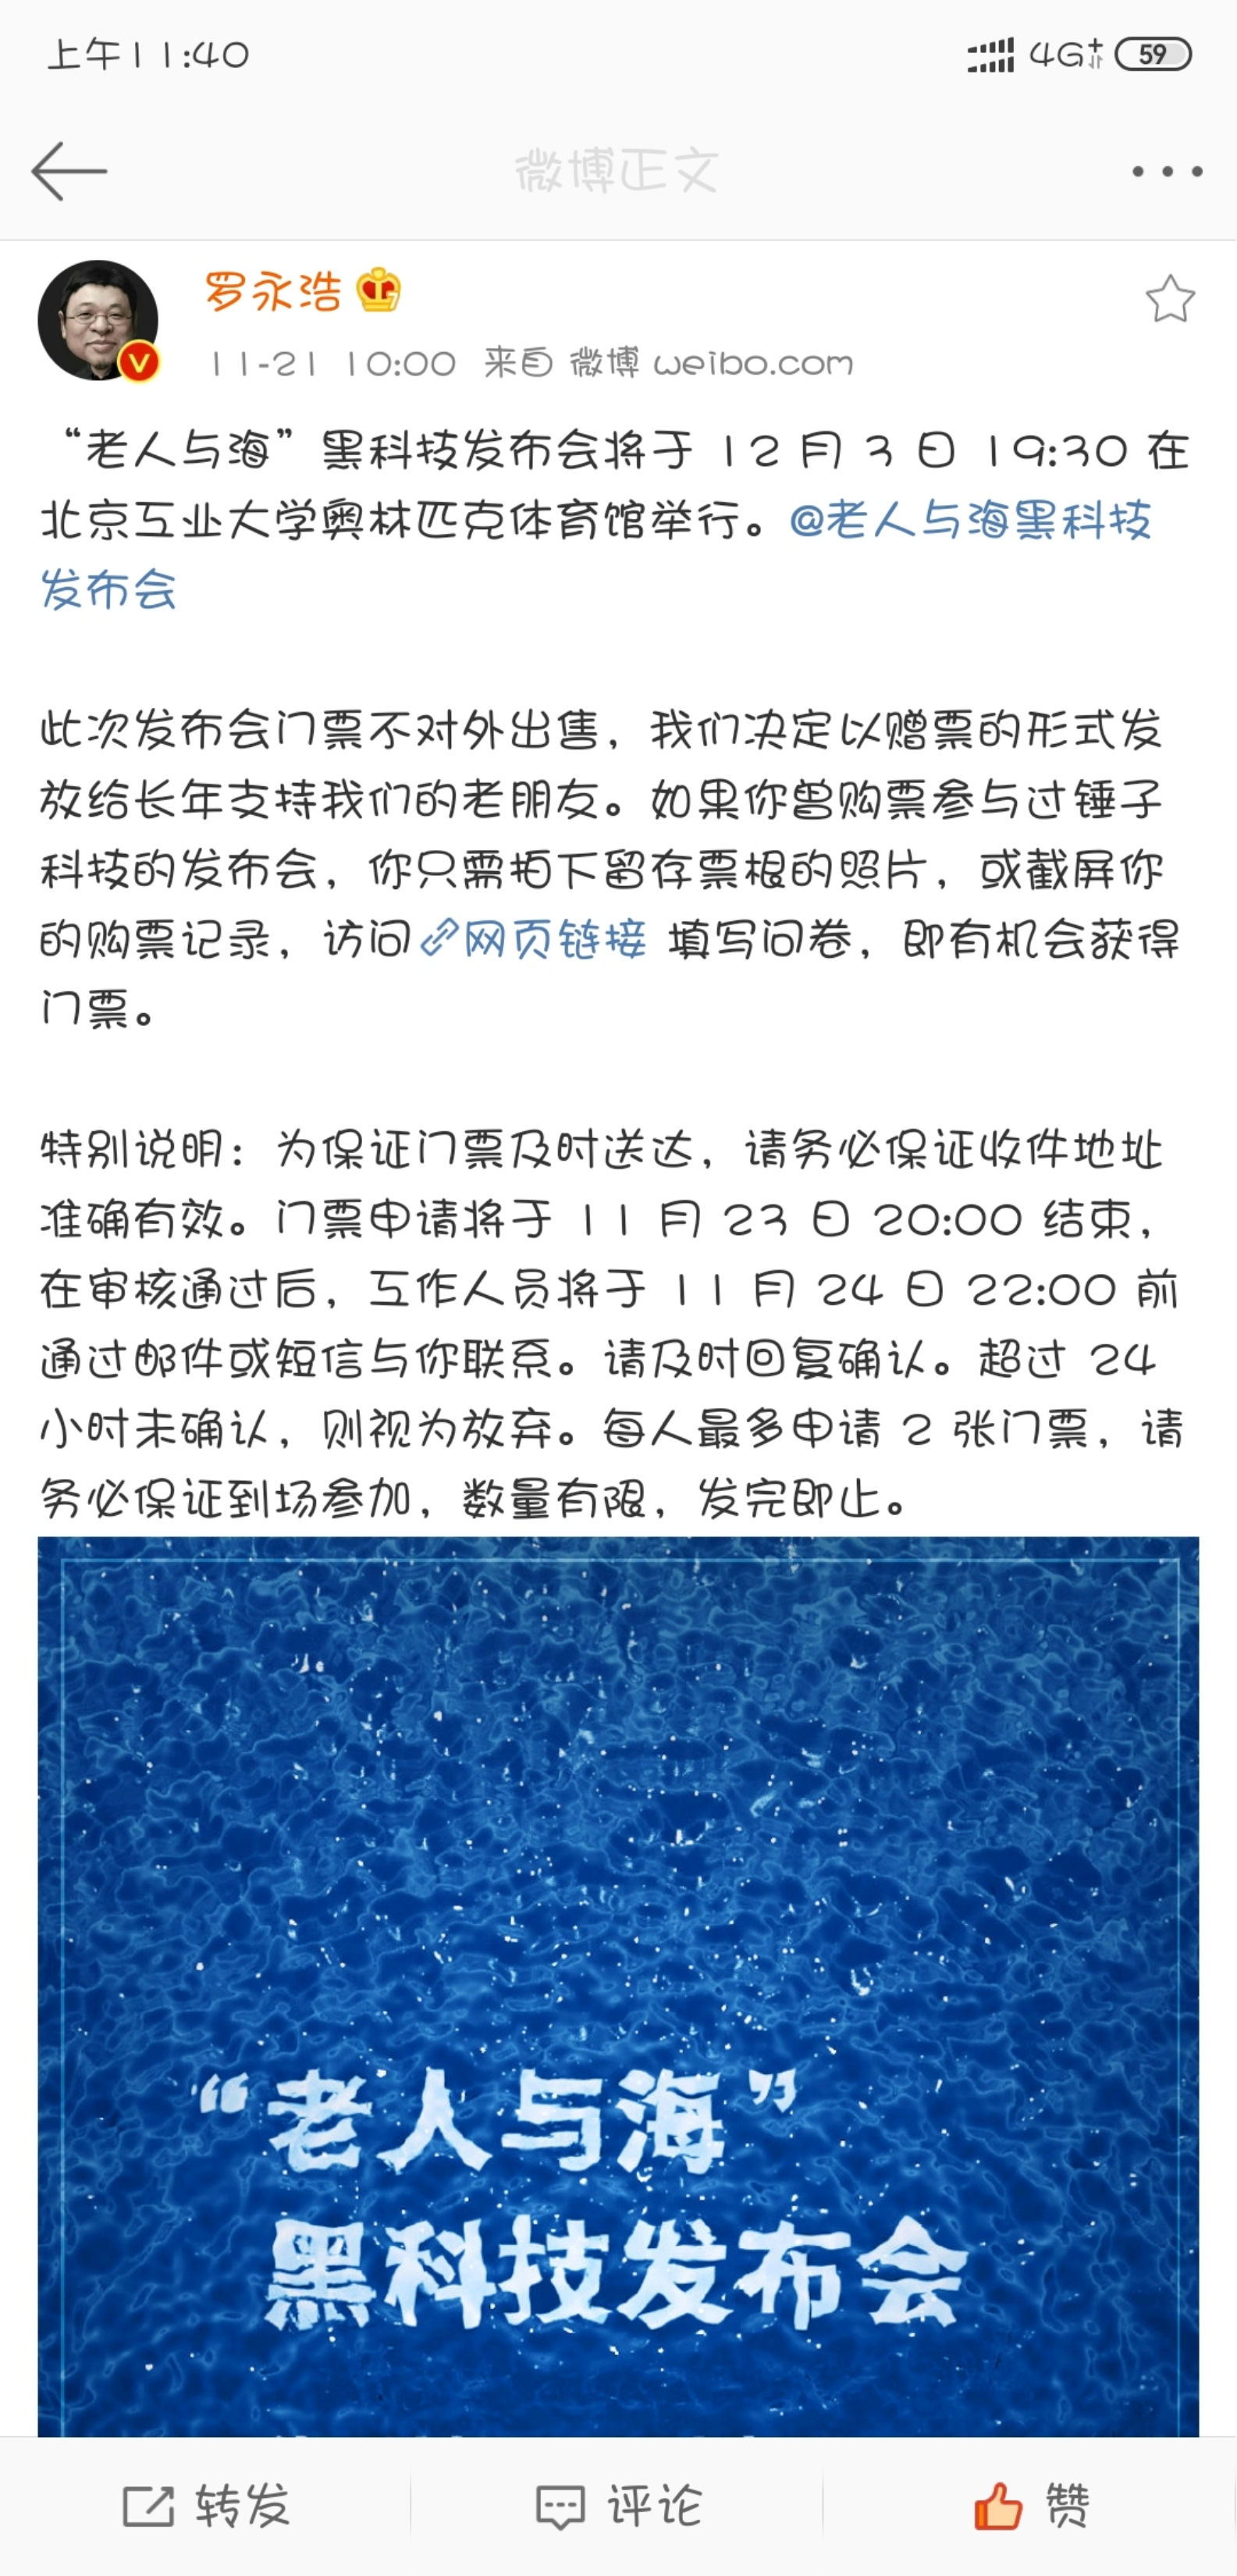 Screenshot_2019-11-21-11-40-20-610_com.sina.weibo.jpg